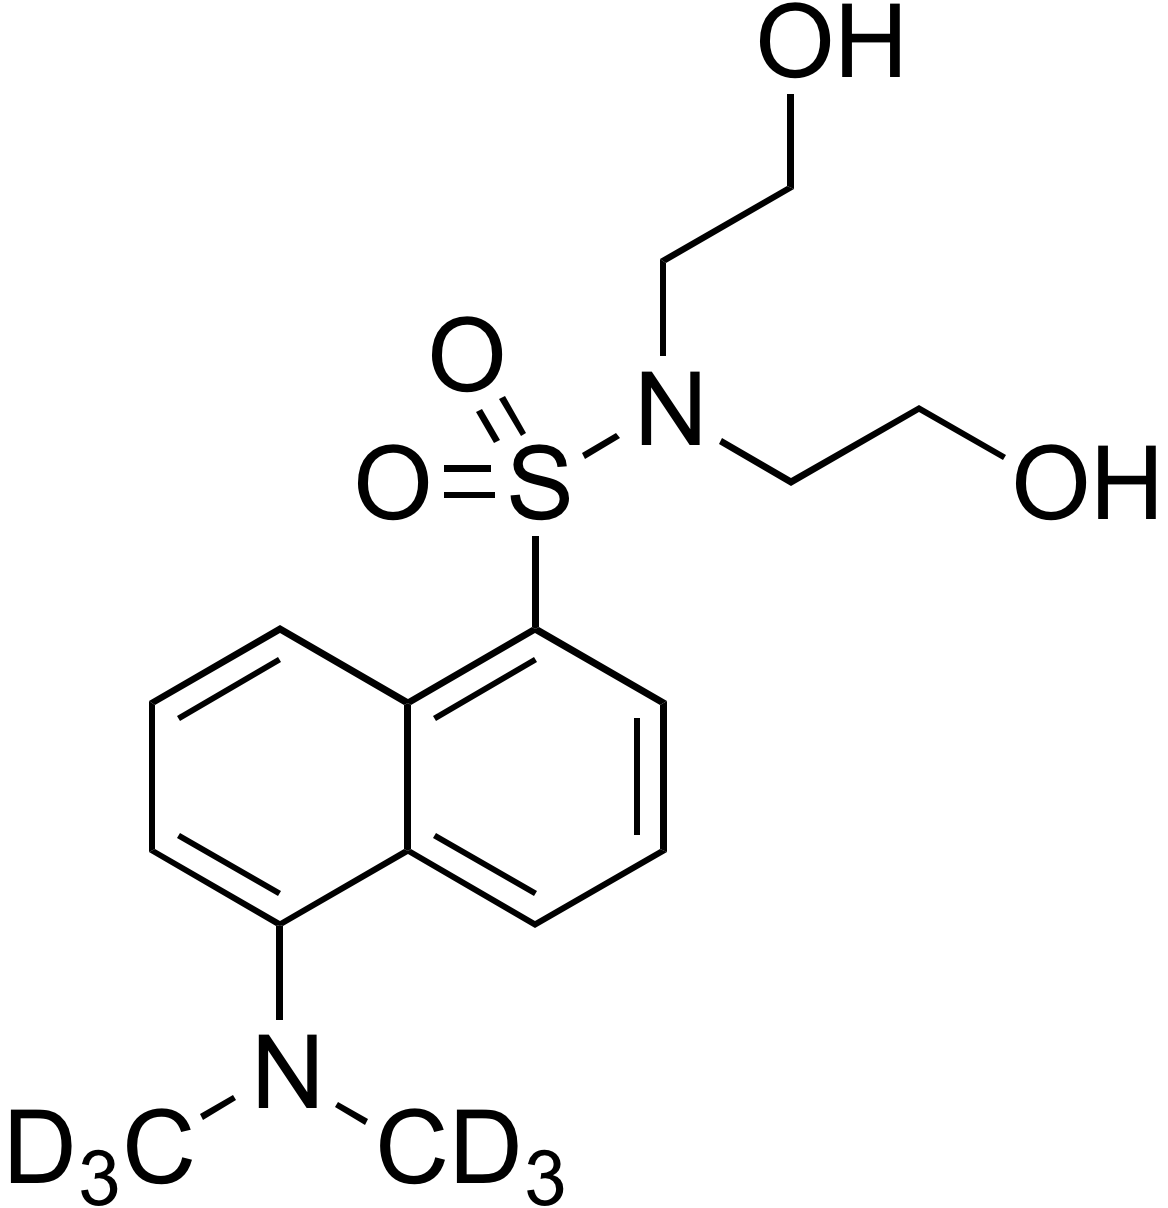 Dansyl-d<sub>6</sub> diethanolamine